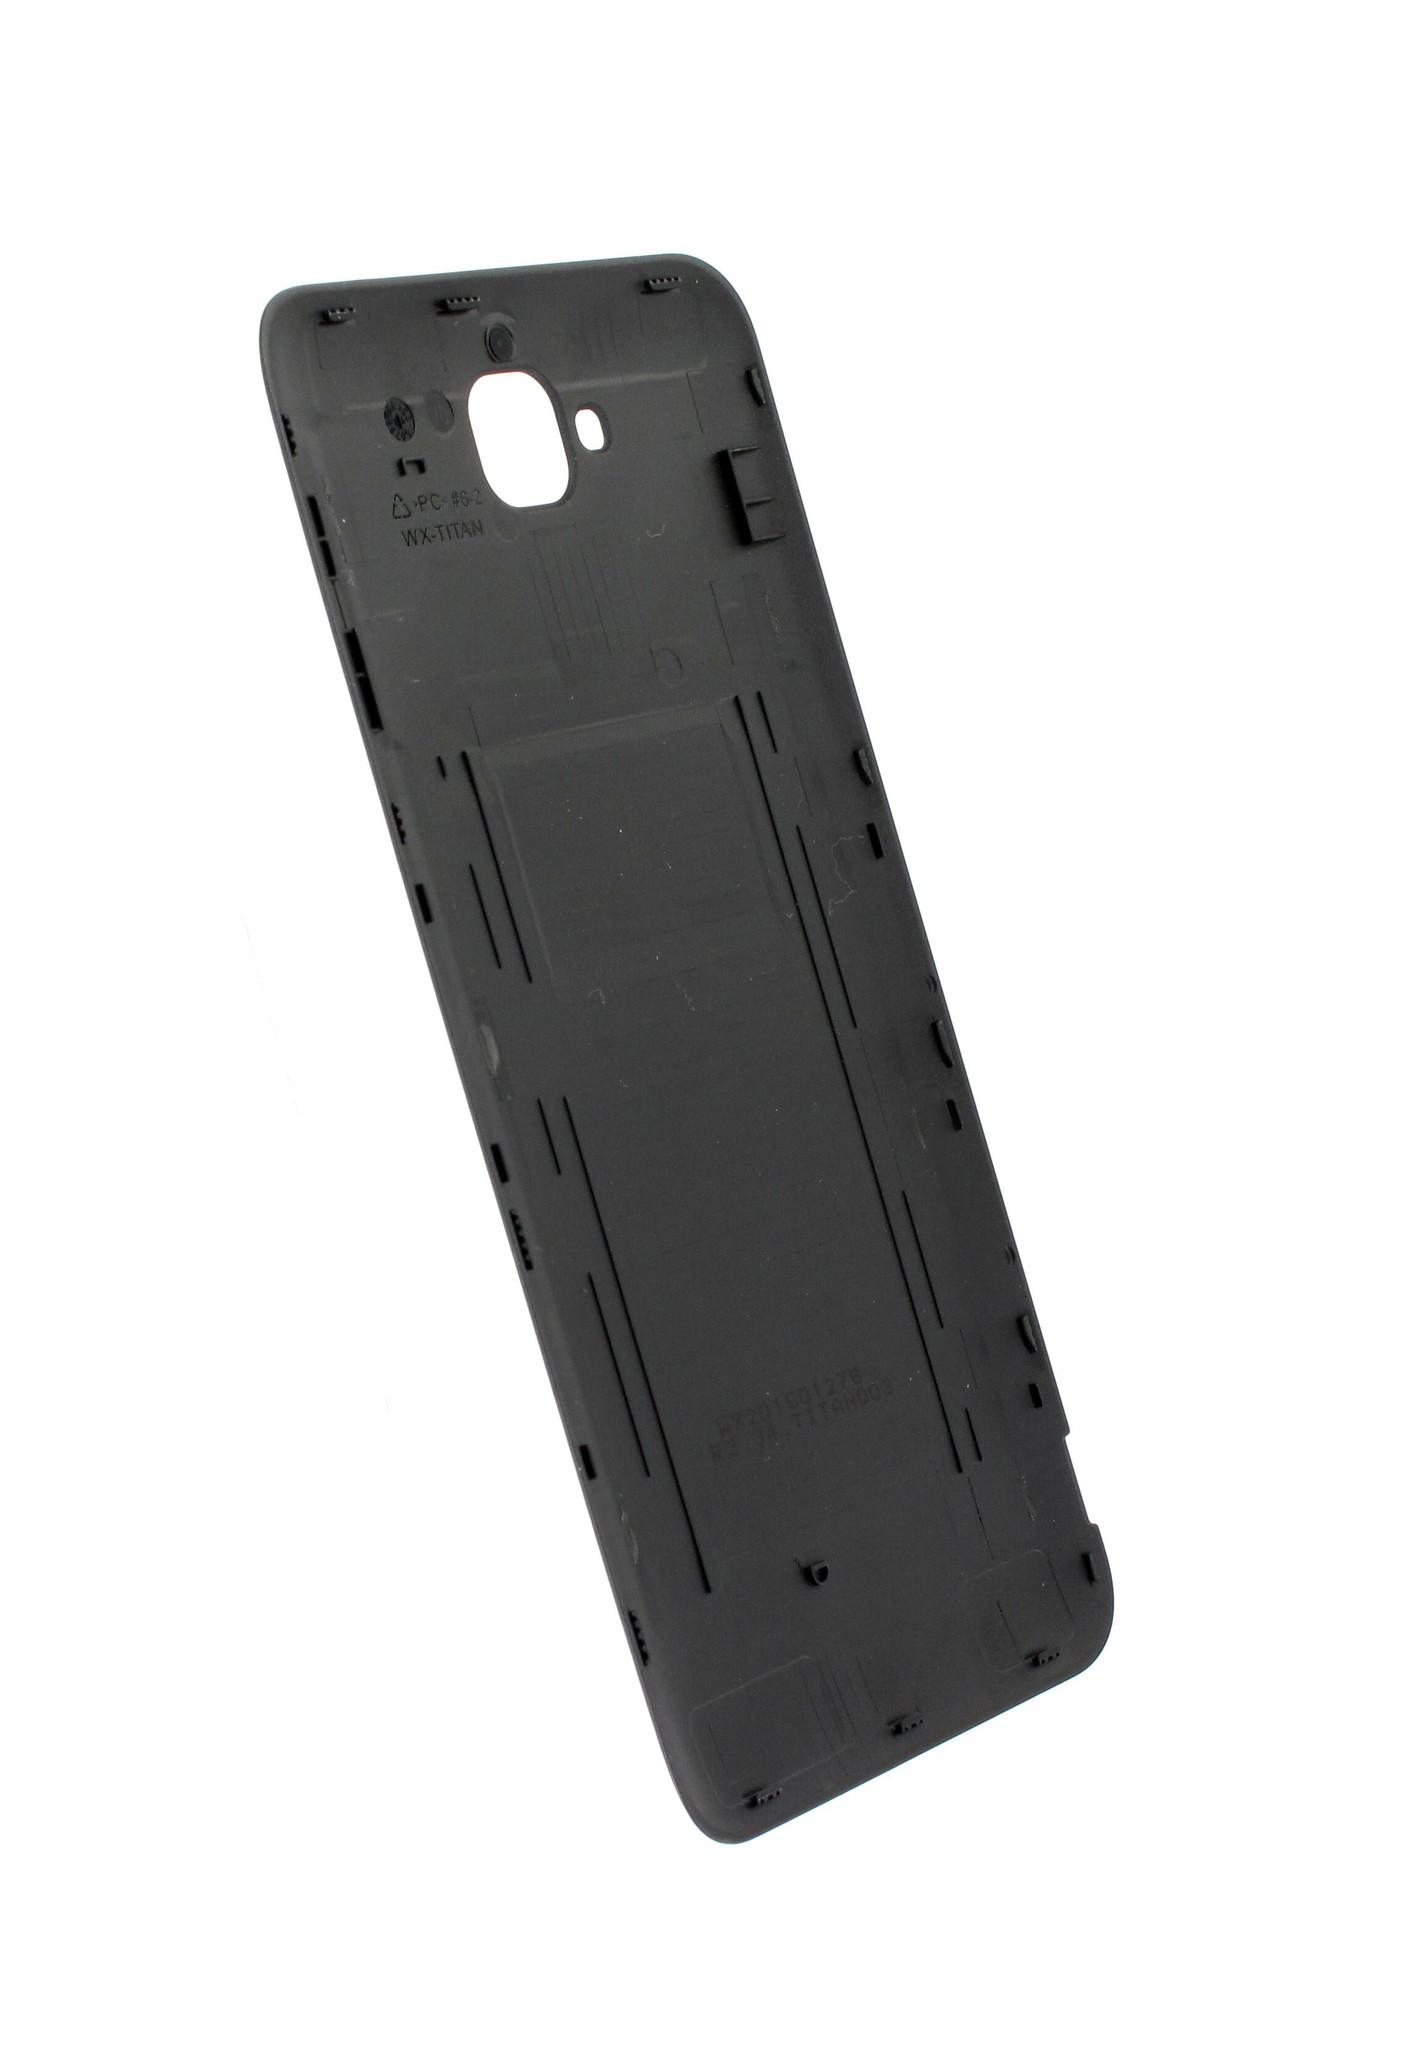 Huawei Y6 Pro 4G (TIT-AL00) Battery Cover, DarkGrey, 97070LEL